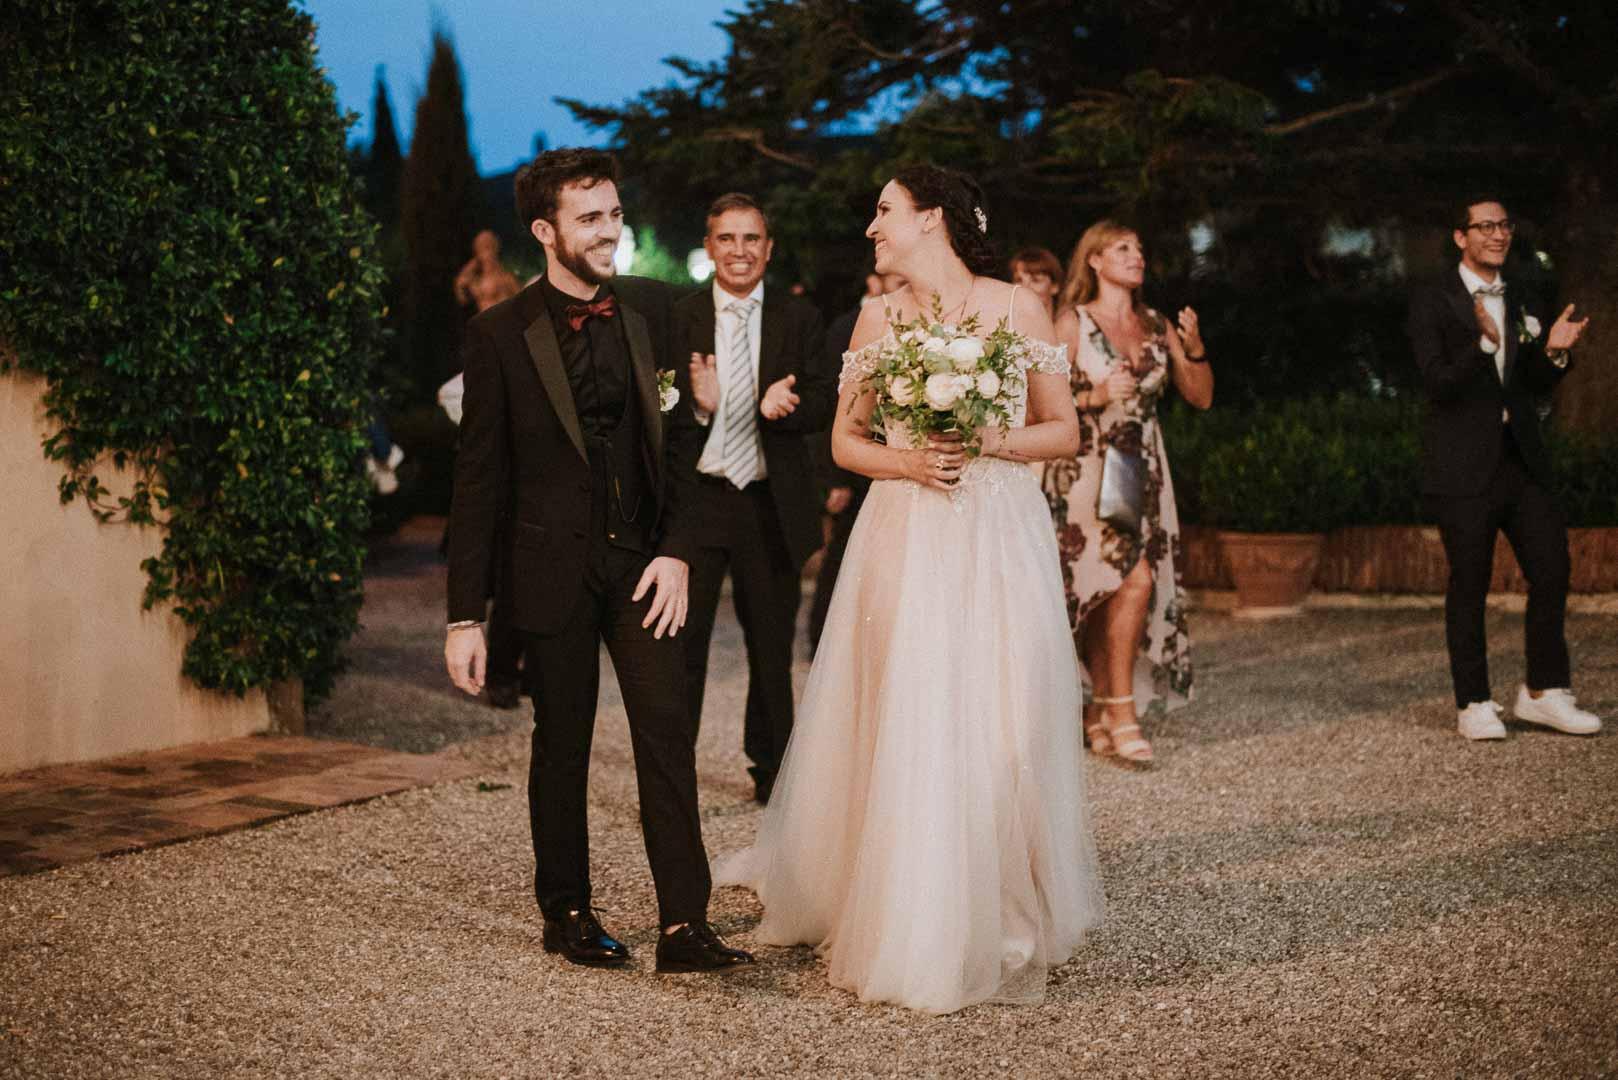 wedding-photographer-destination-fineart-bespoke-reportage-tuscany-villascorzi-vivianeizzo-spazio46-162